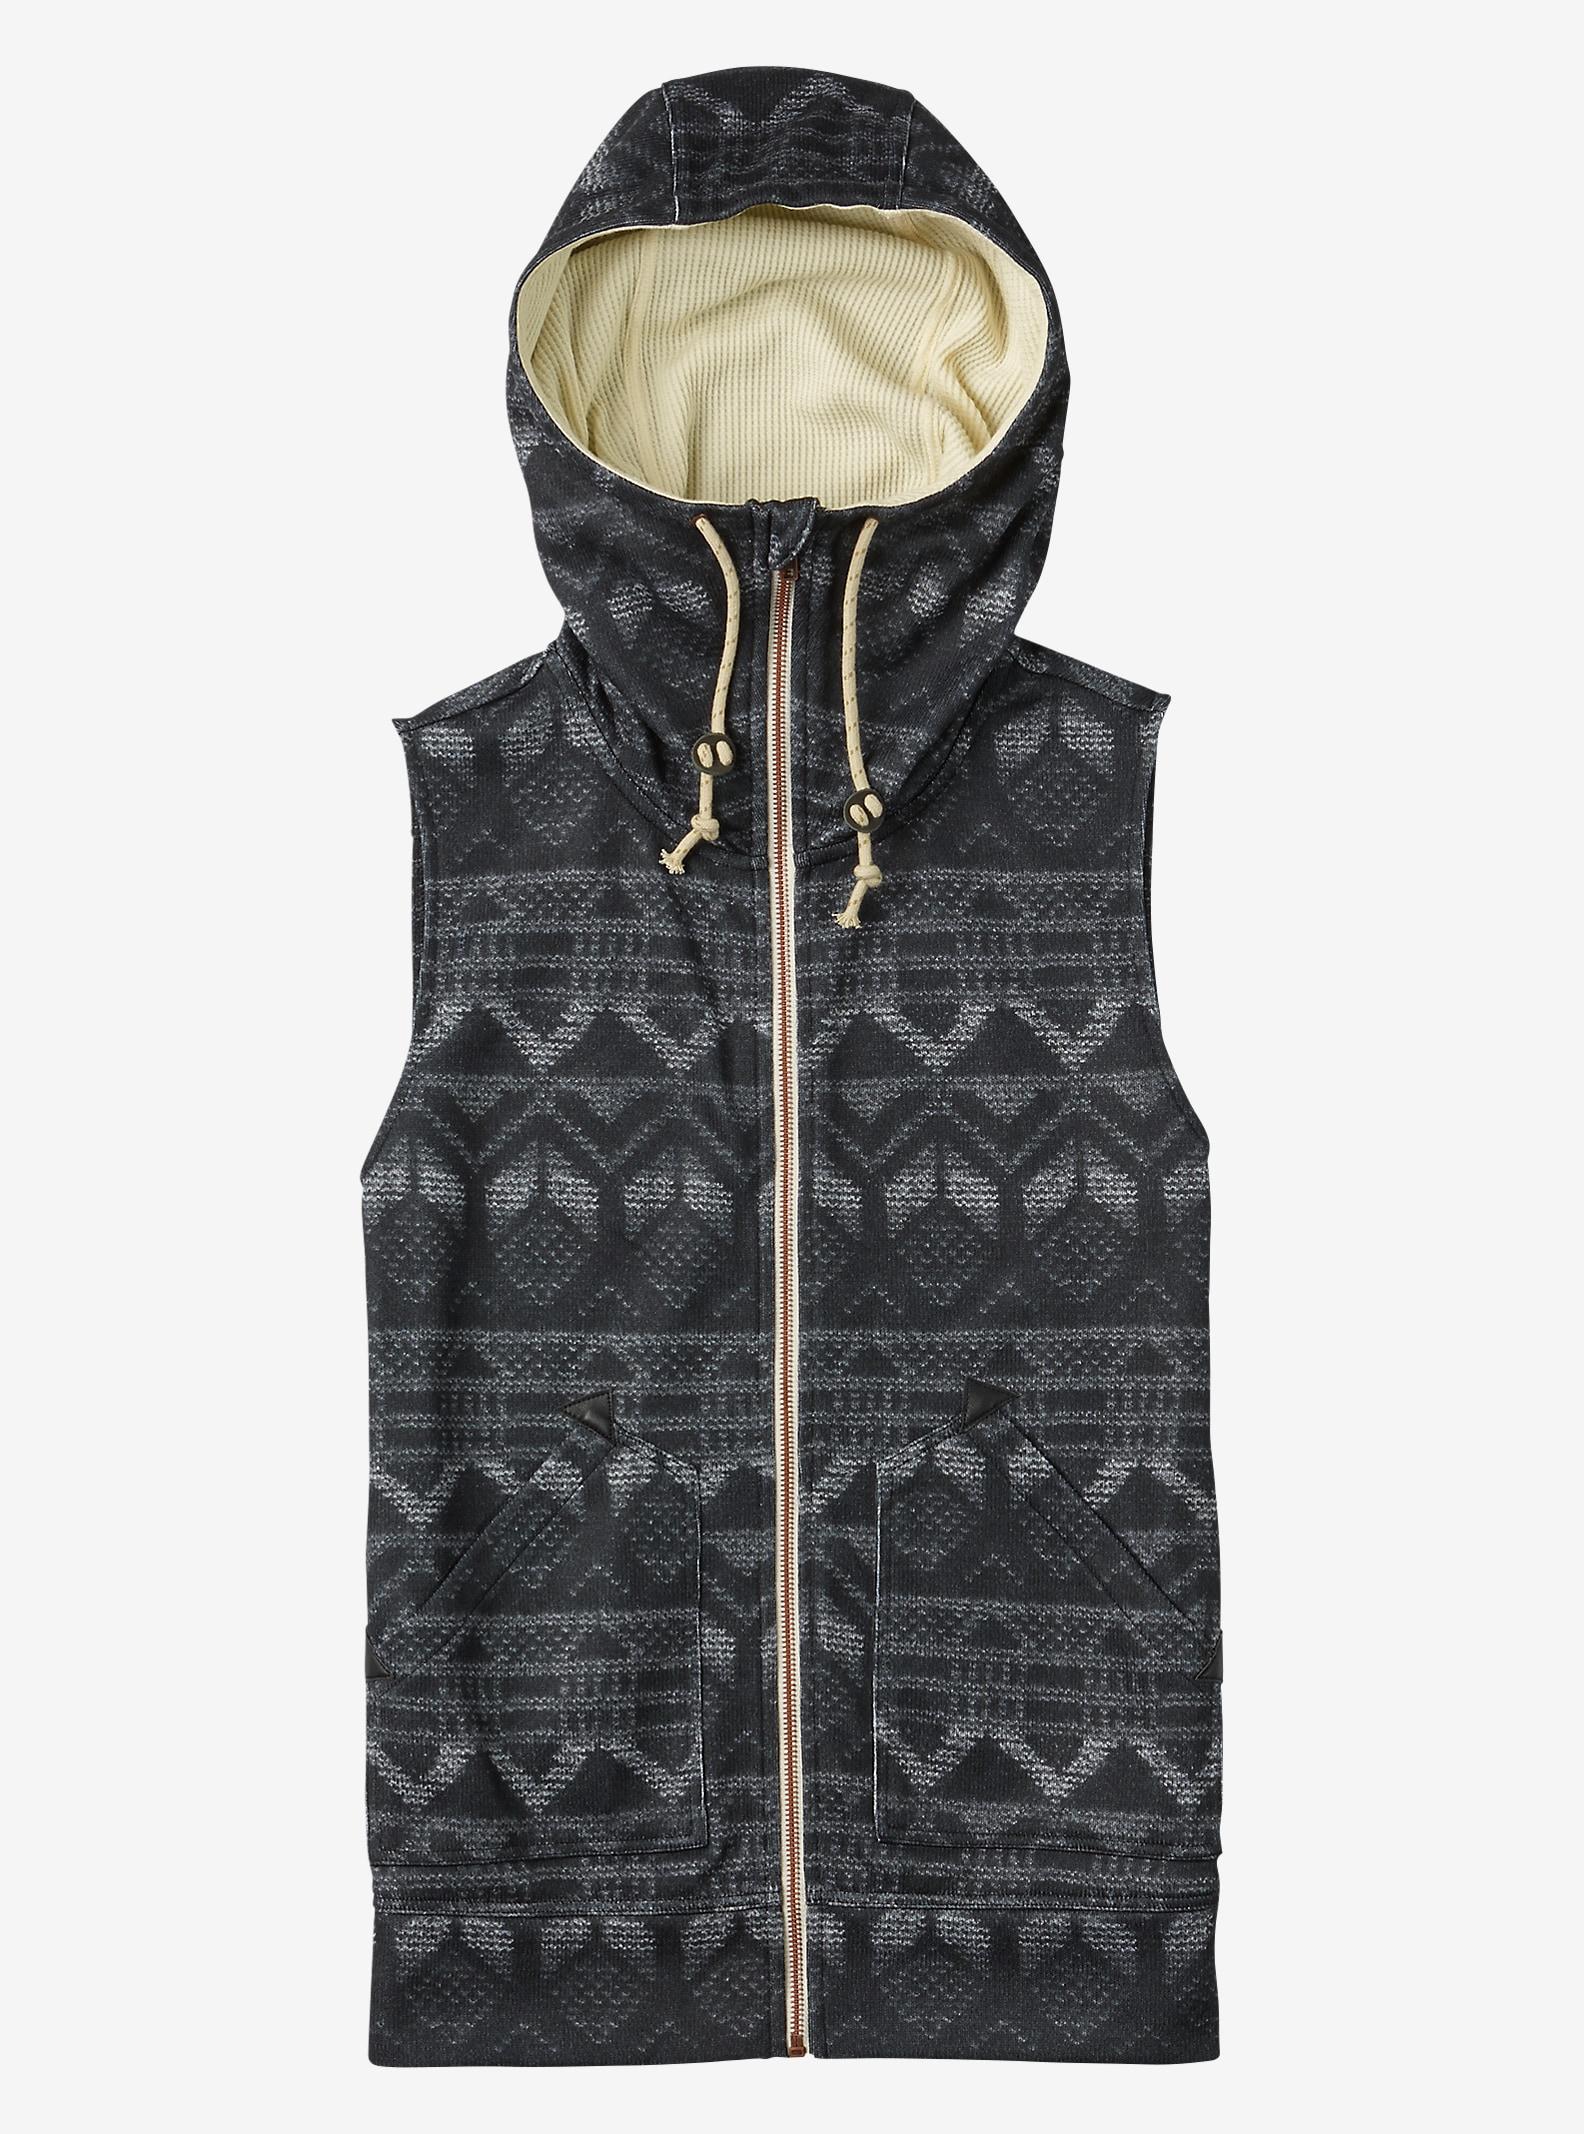 Women's Sale Jackets & Outerwear | Burton Snowboards